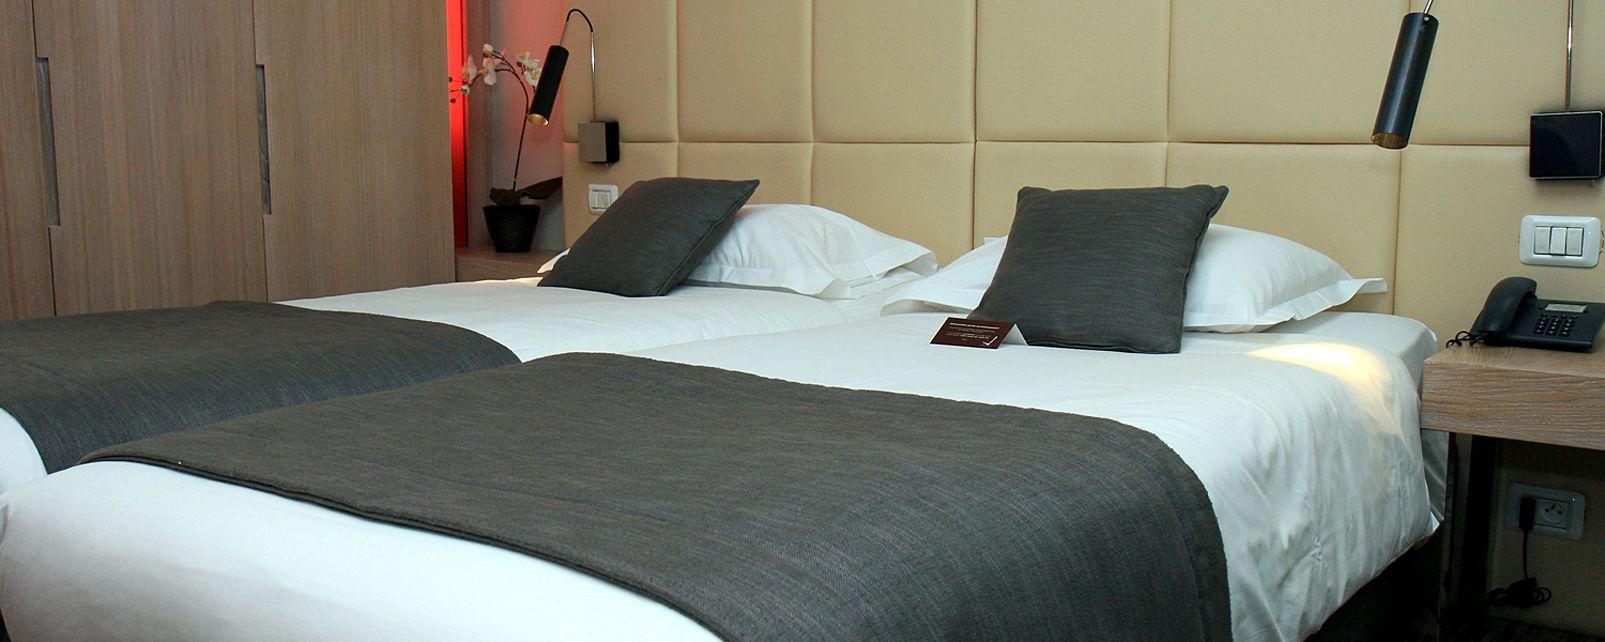 Hotel Golden Tulip Hotel De Noailles